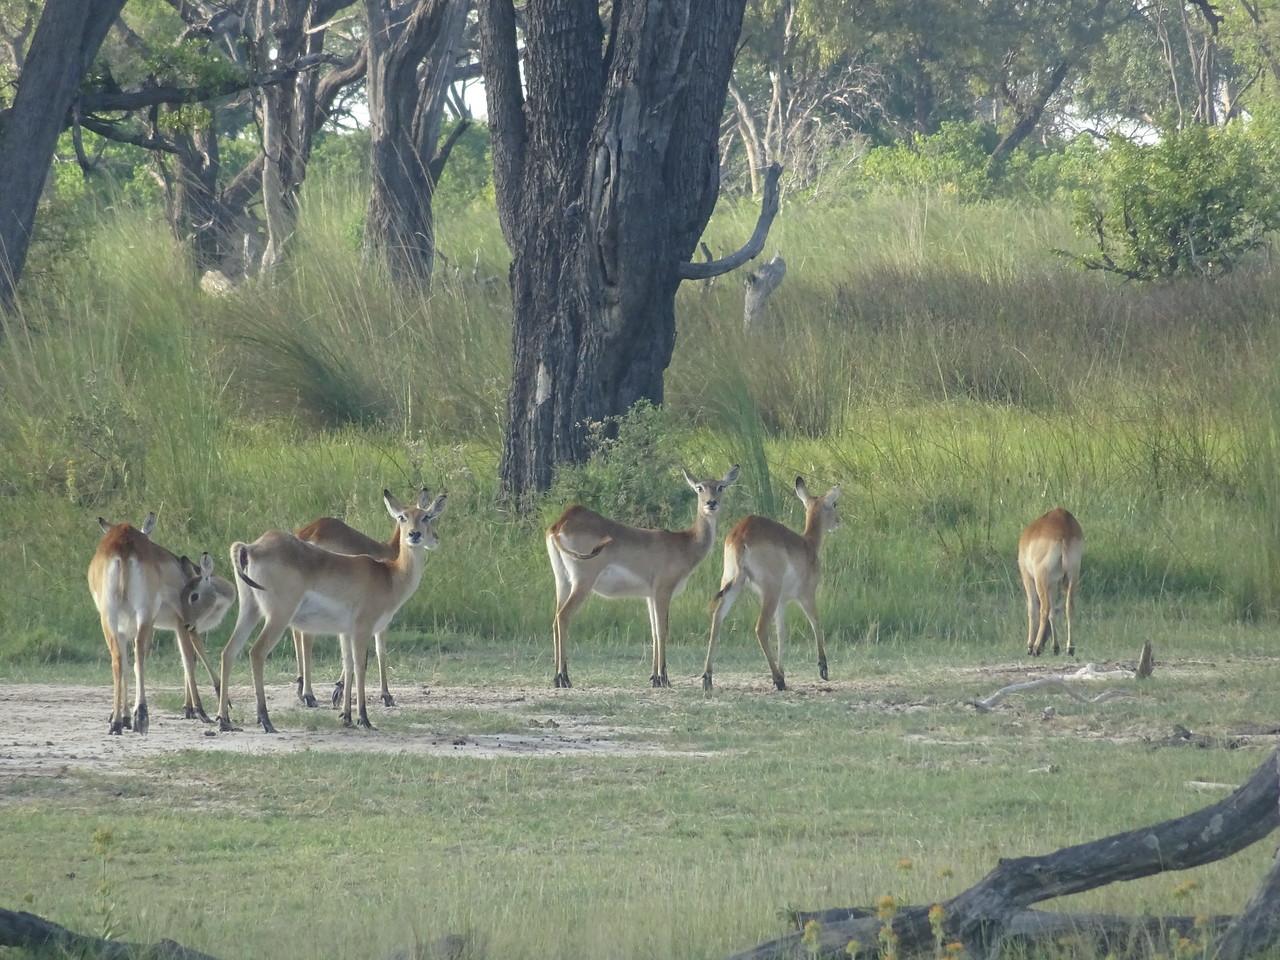 029_Okavango Delta, Moremi Game Reserve  4WD Safari  Impala herd  All females